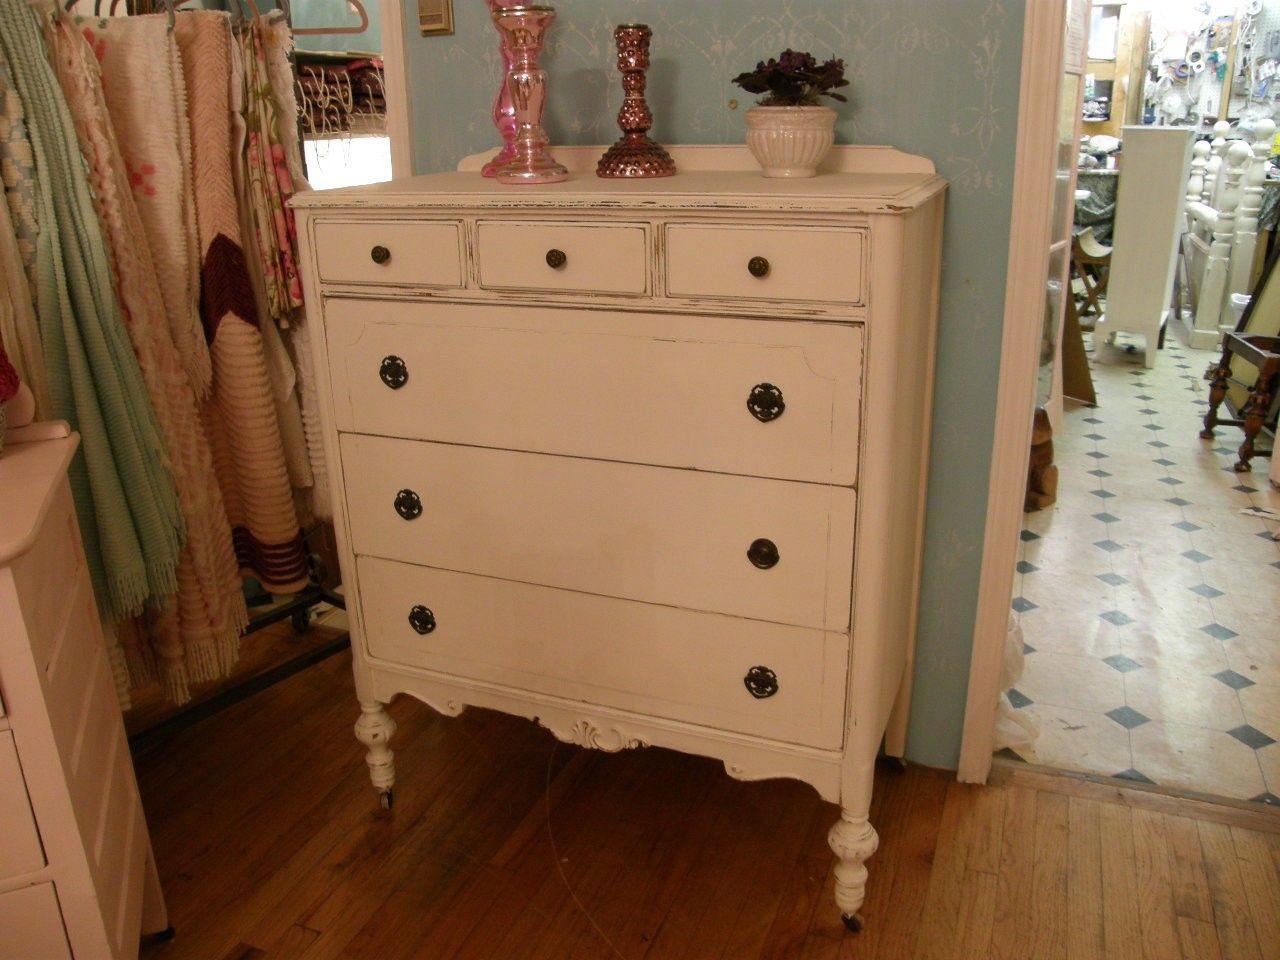 Antique Shabby Chic Dresser White Distressed Tall Sooo Pretty 550 00 Via Etsy